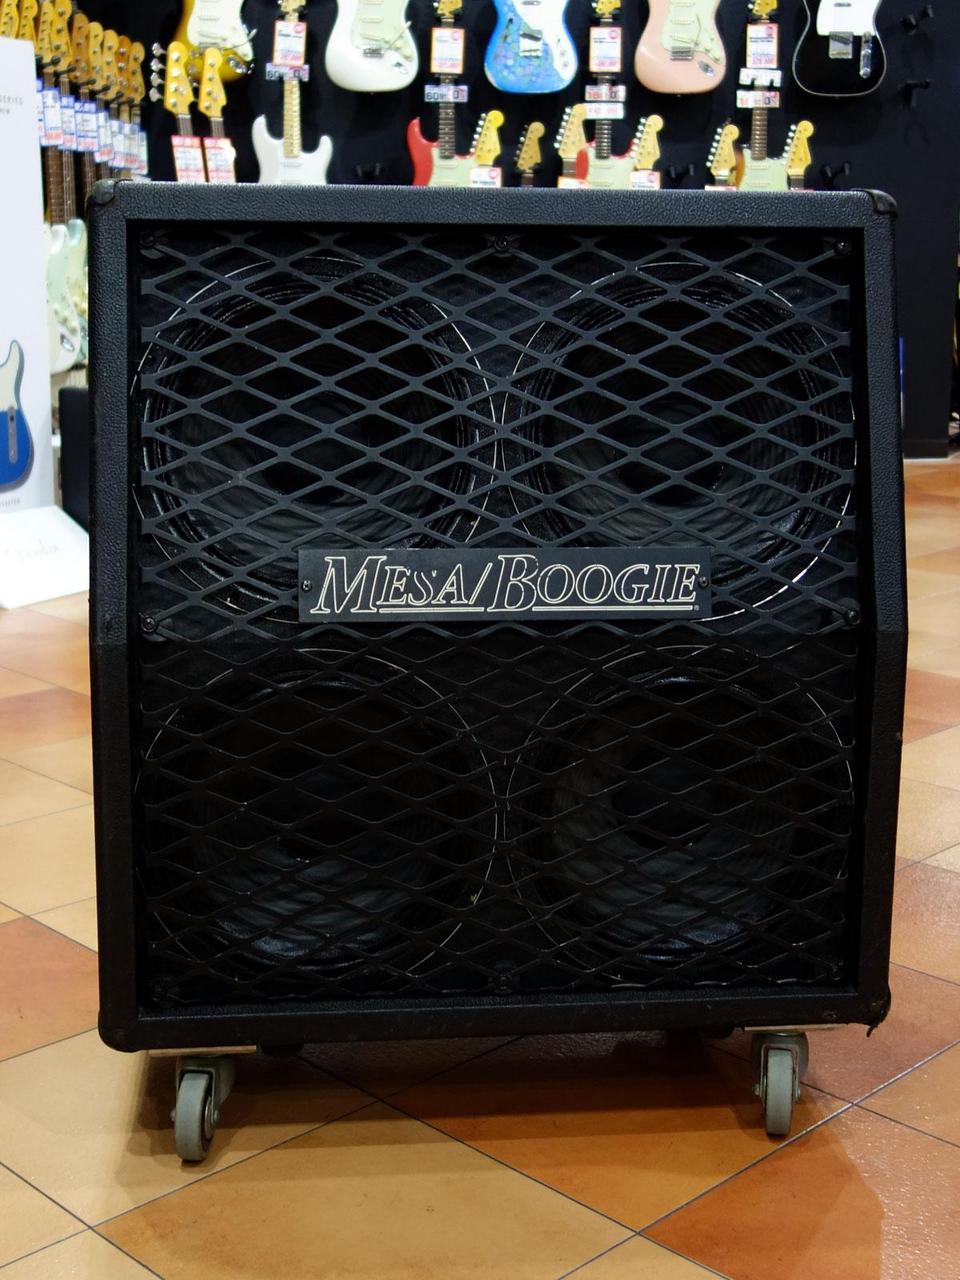 Mesa / Boogie 4x12 Slant Cabinet - Celestion G12T-75x4